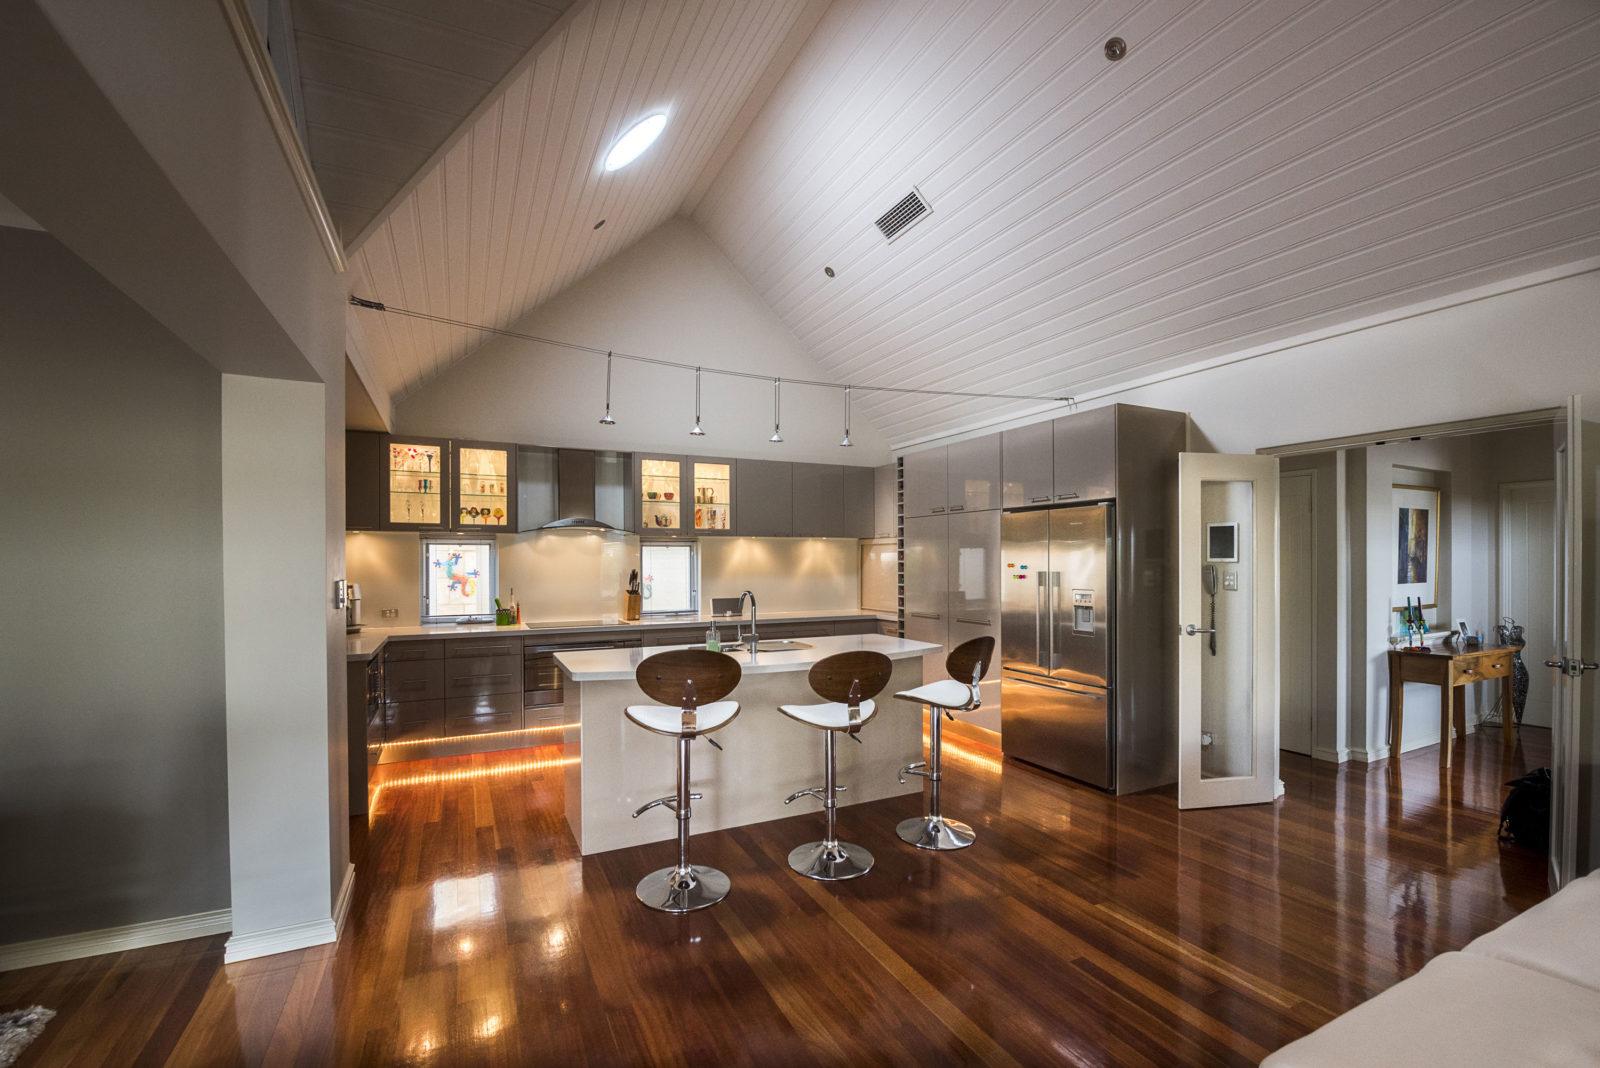 Residential Gallery Brighten A Dark Room